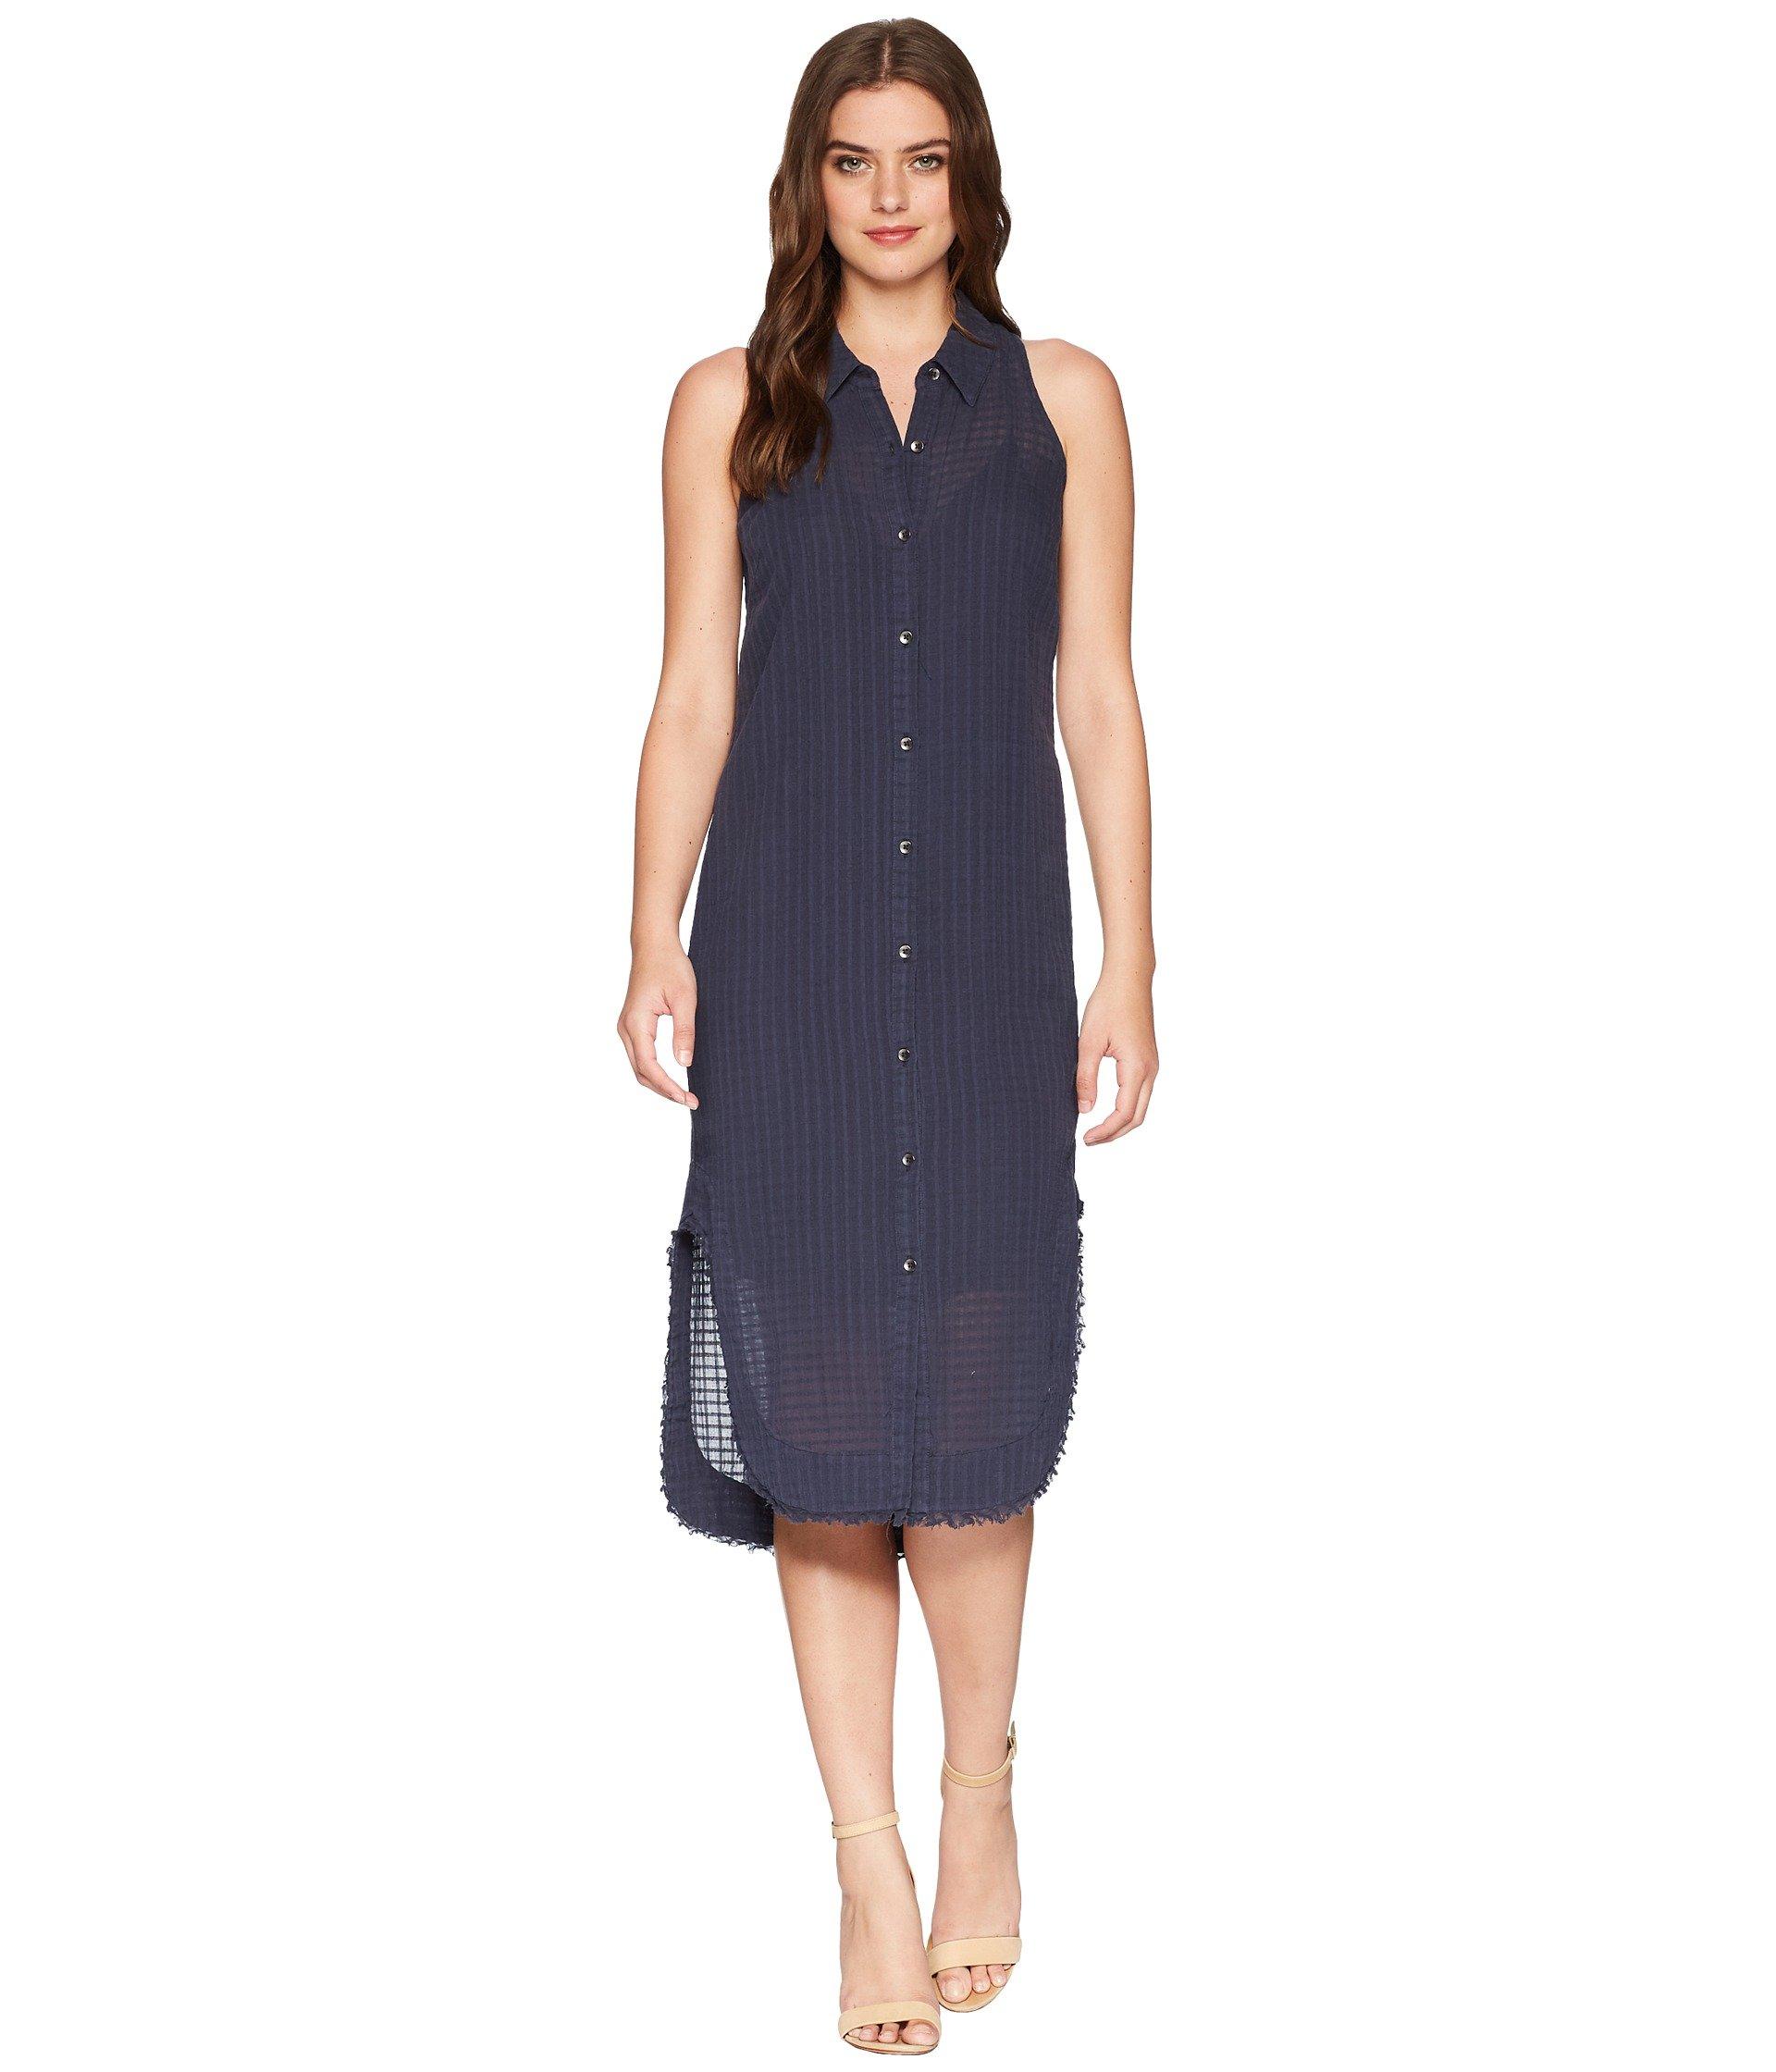 Splendid Women's Shirt Dress with Fray